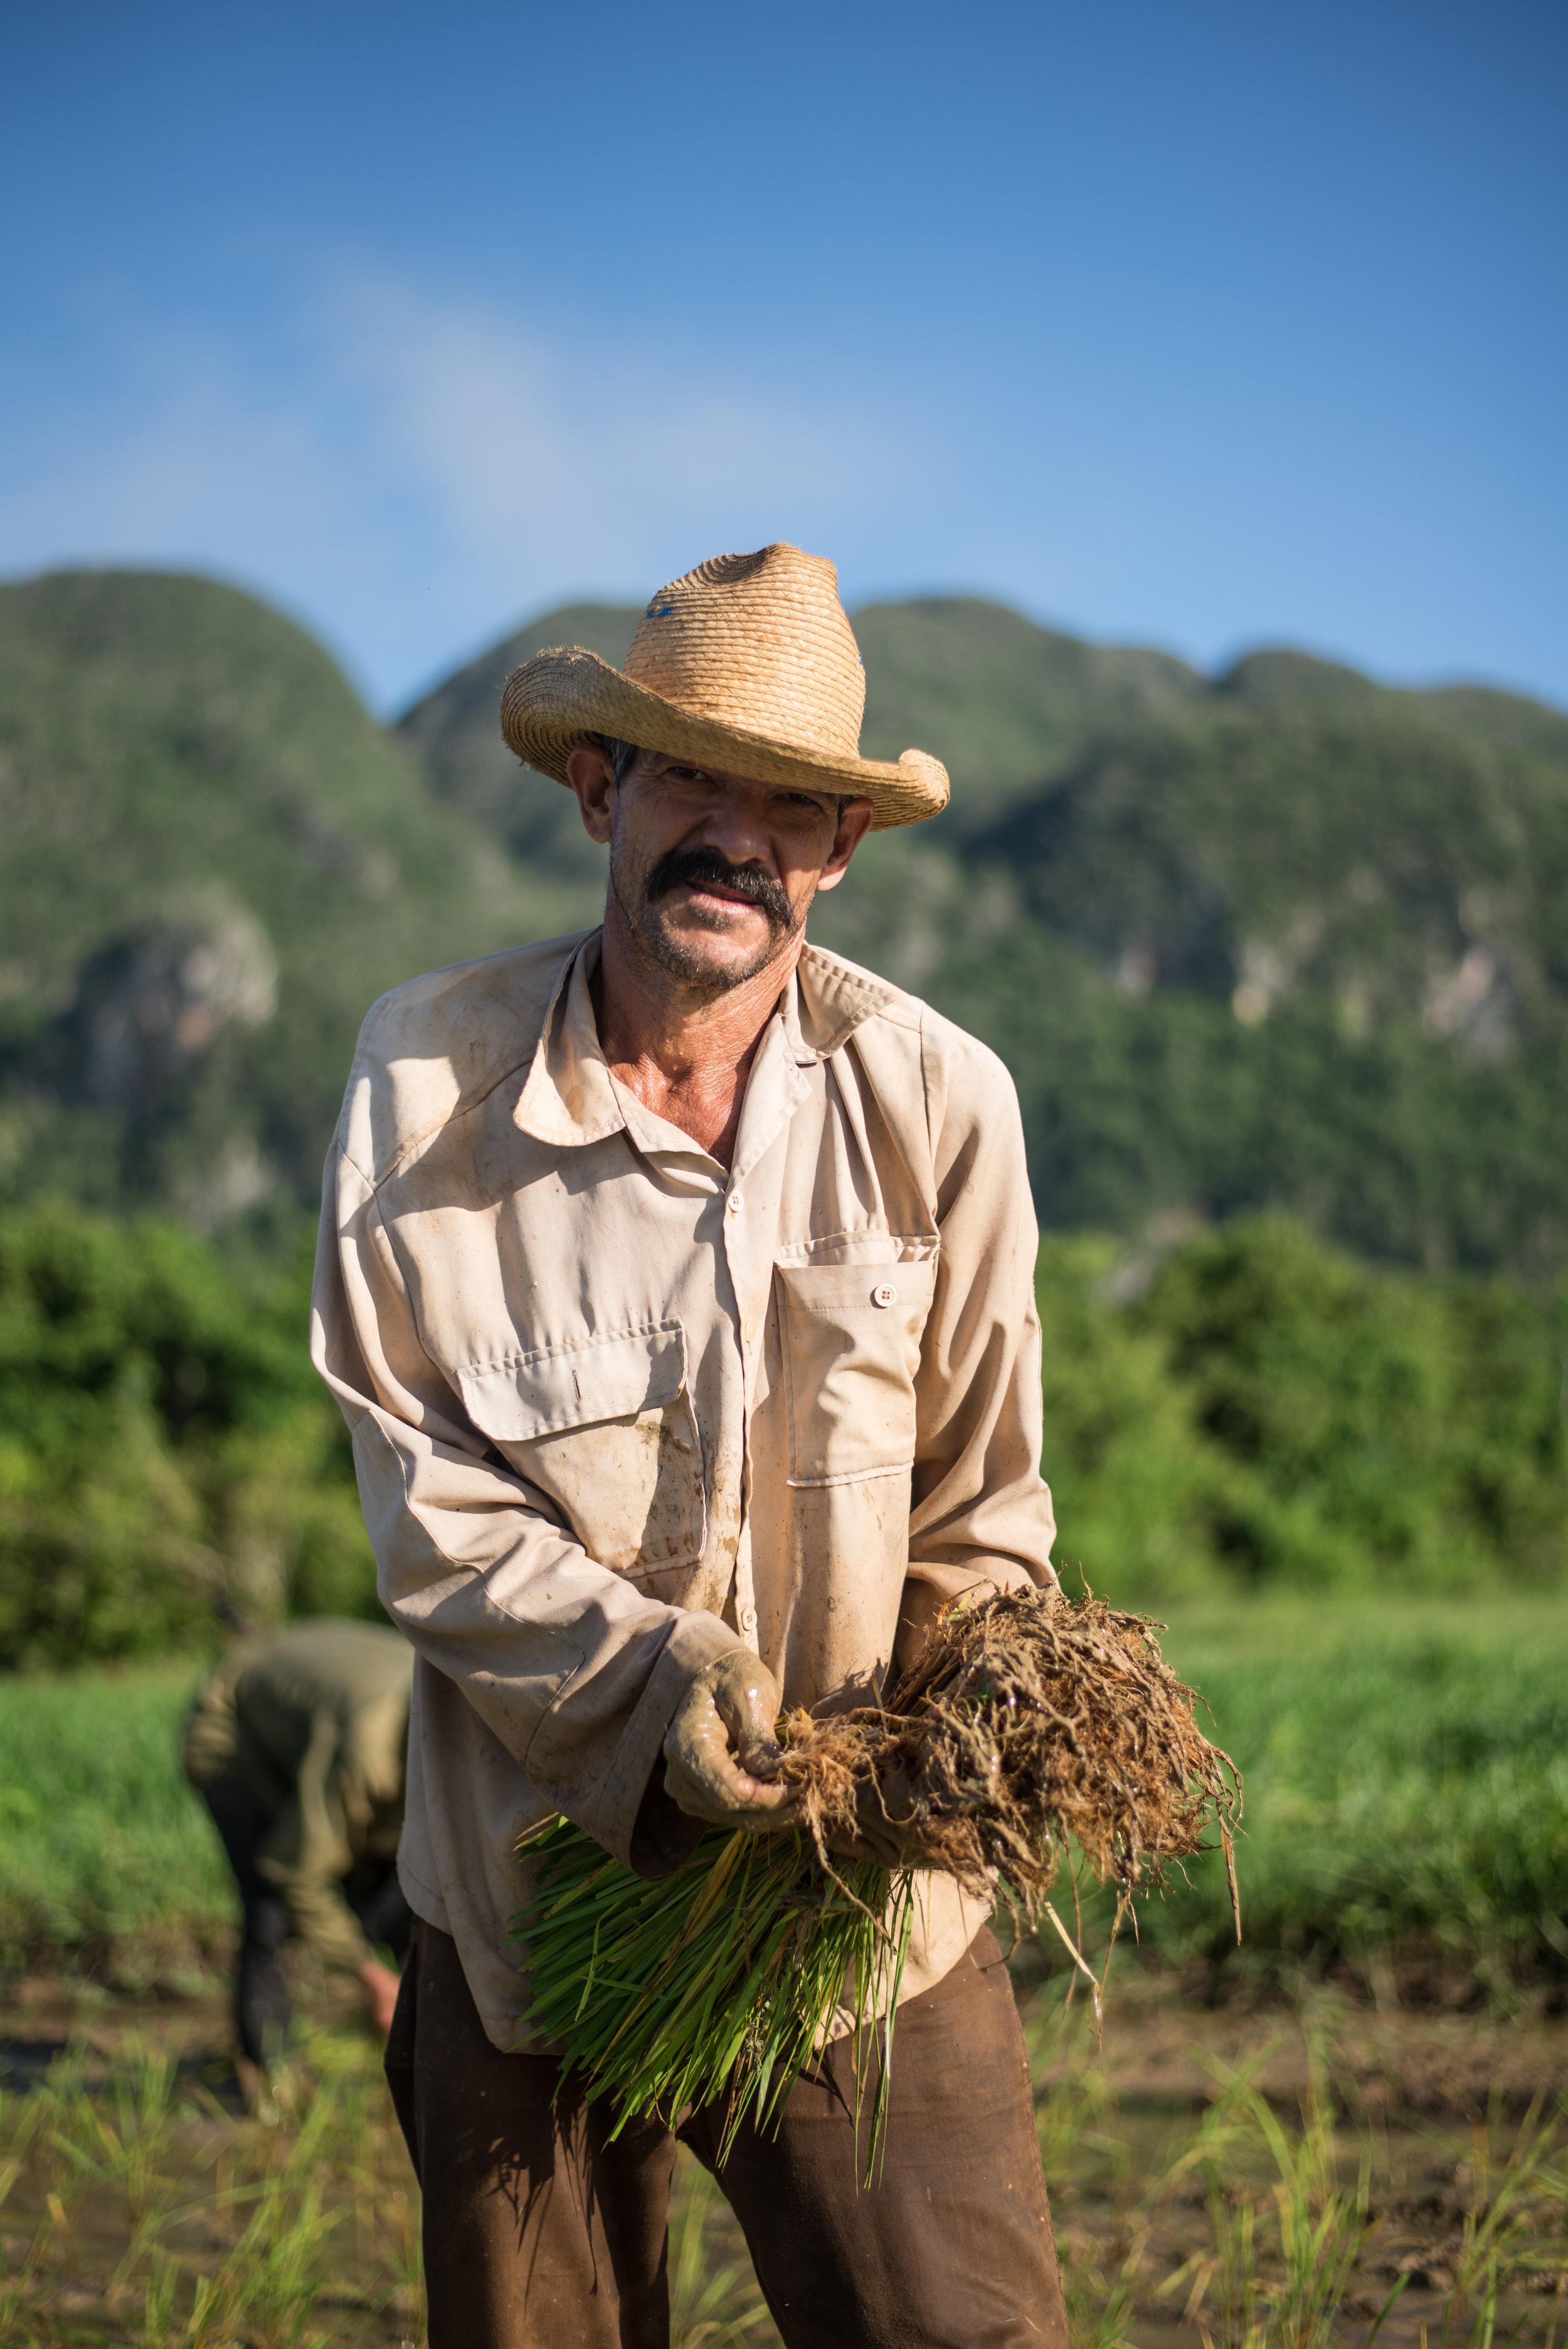 The Rice Paddies, Cuba, 2017